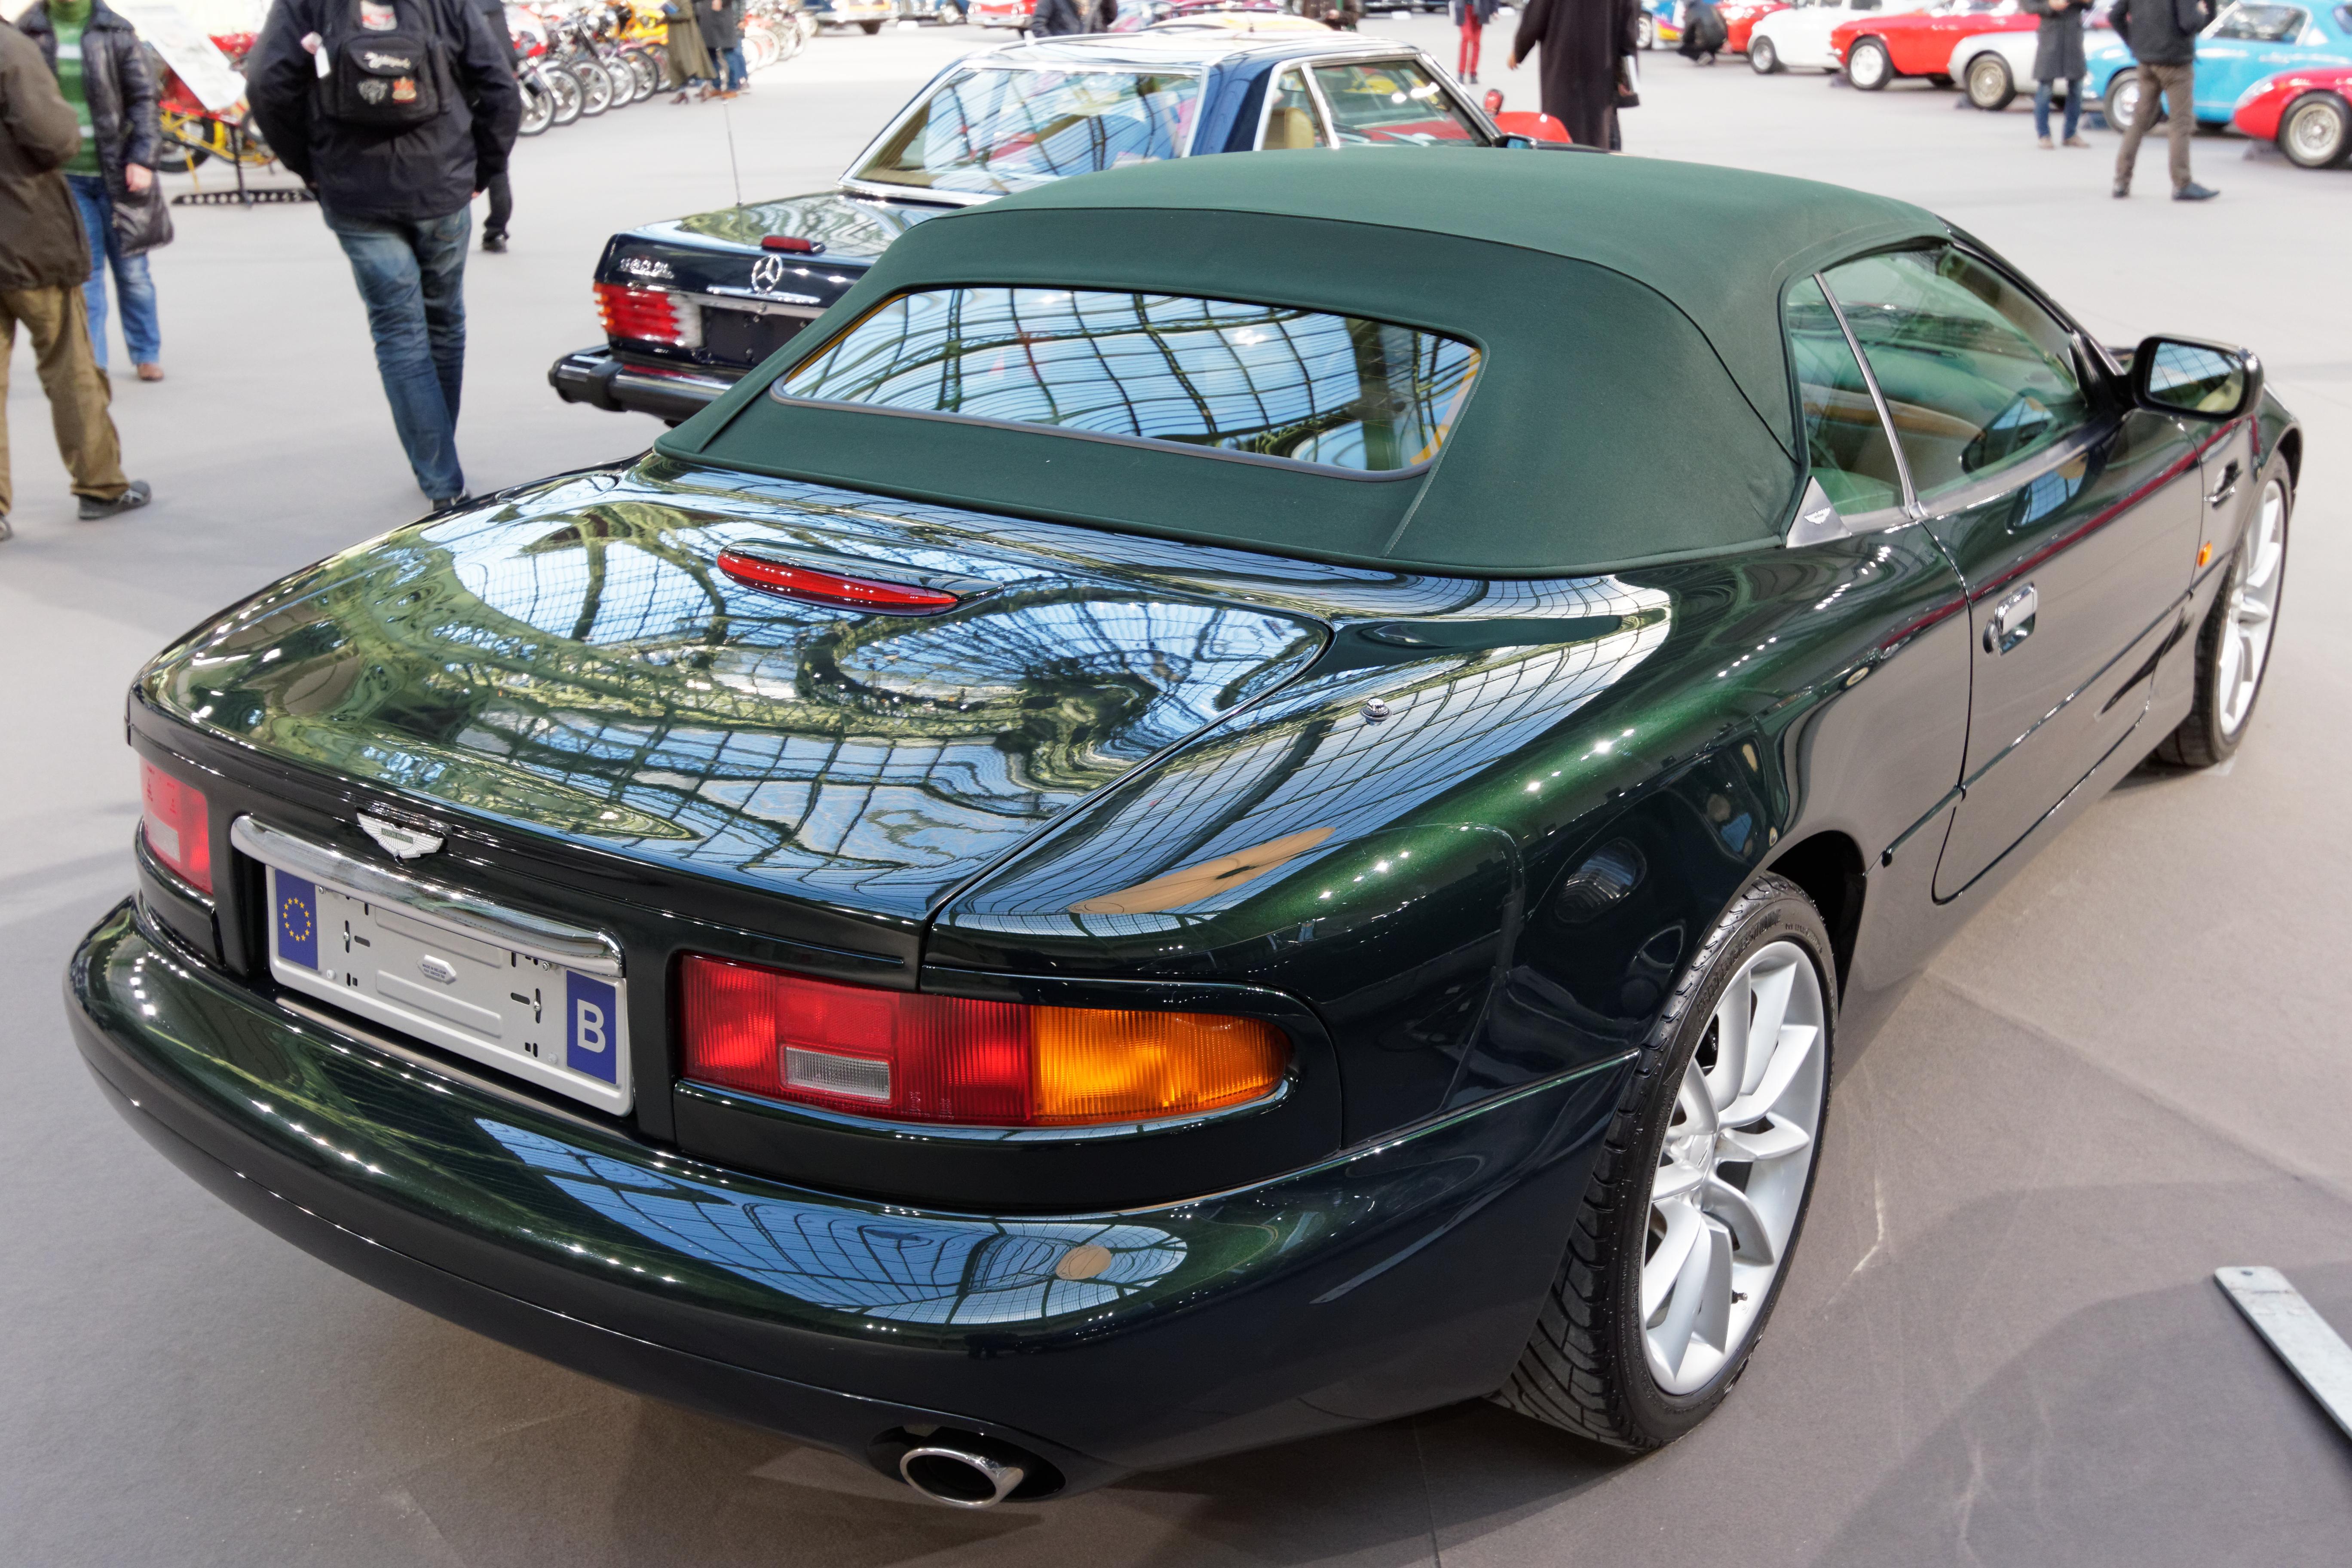 File Paris Bonhams 2015 Aston Martin Db7 V12 Vantage Volante Convertible 2001 005 Jpg Wikimedia Commons